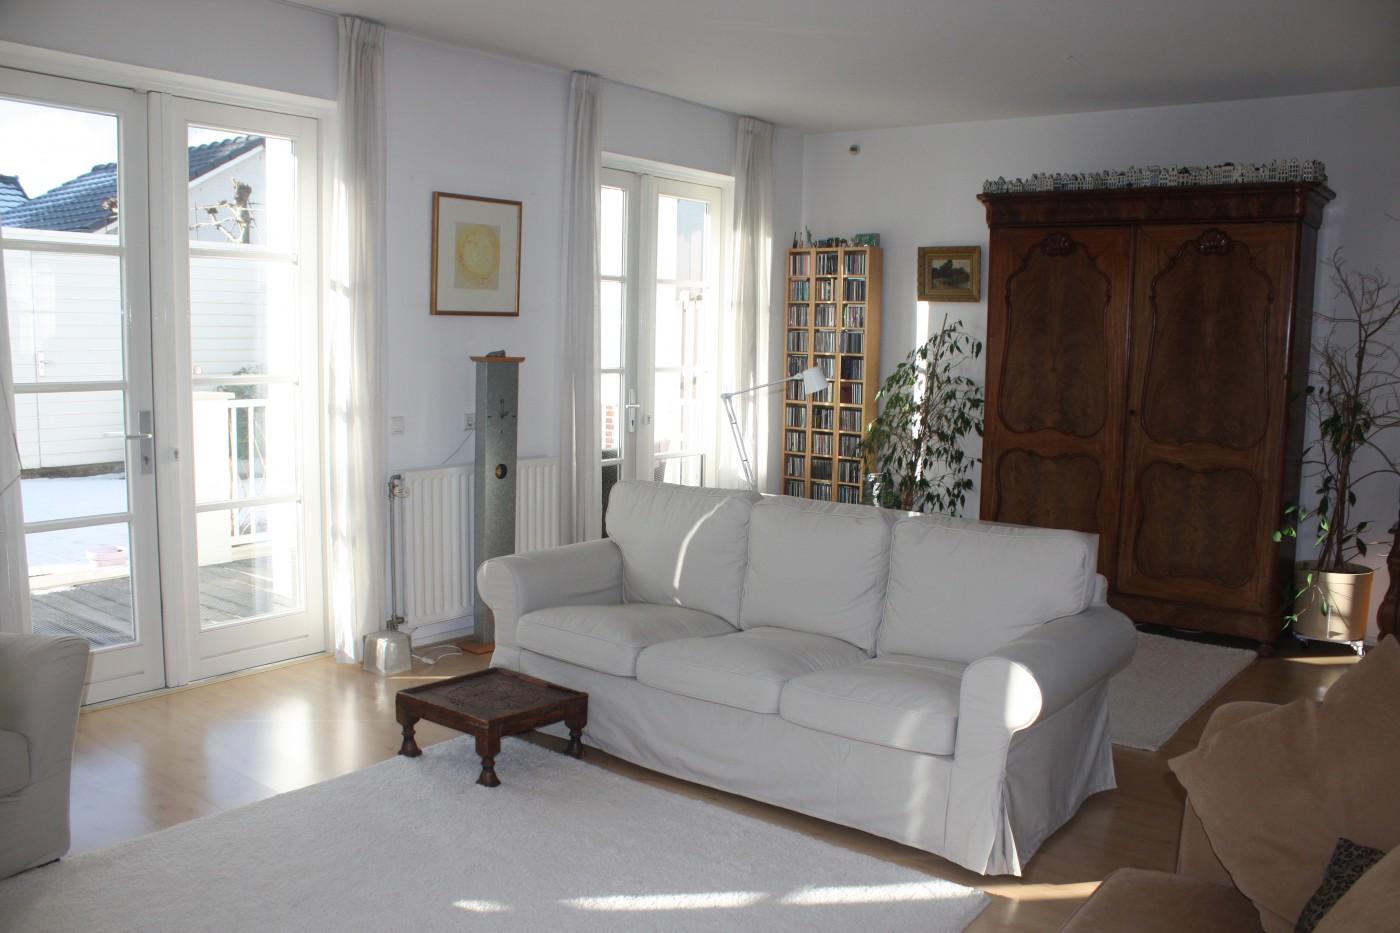 Woonkamer Ideeen Beige : Stunning bruin beige woonkamer pictures new home design